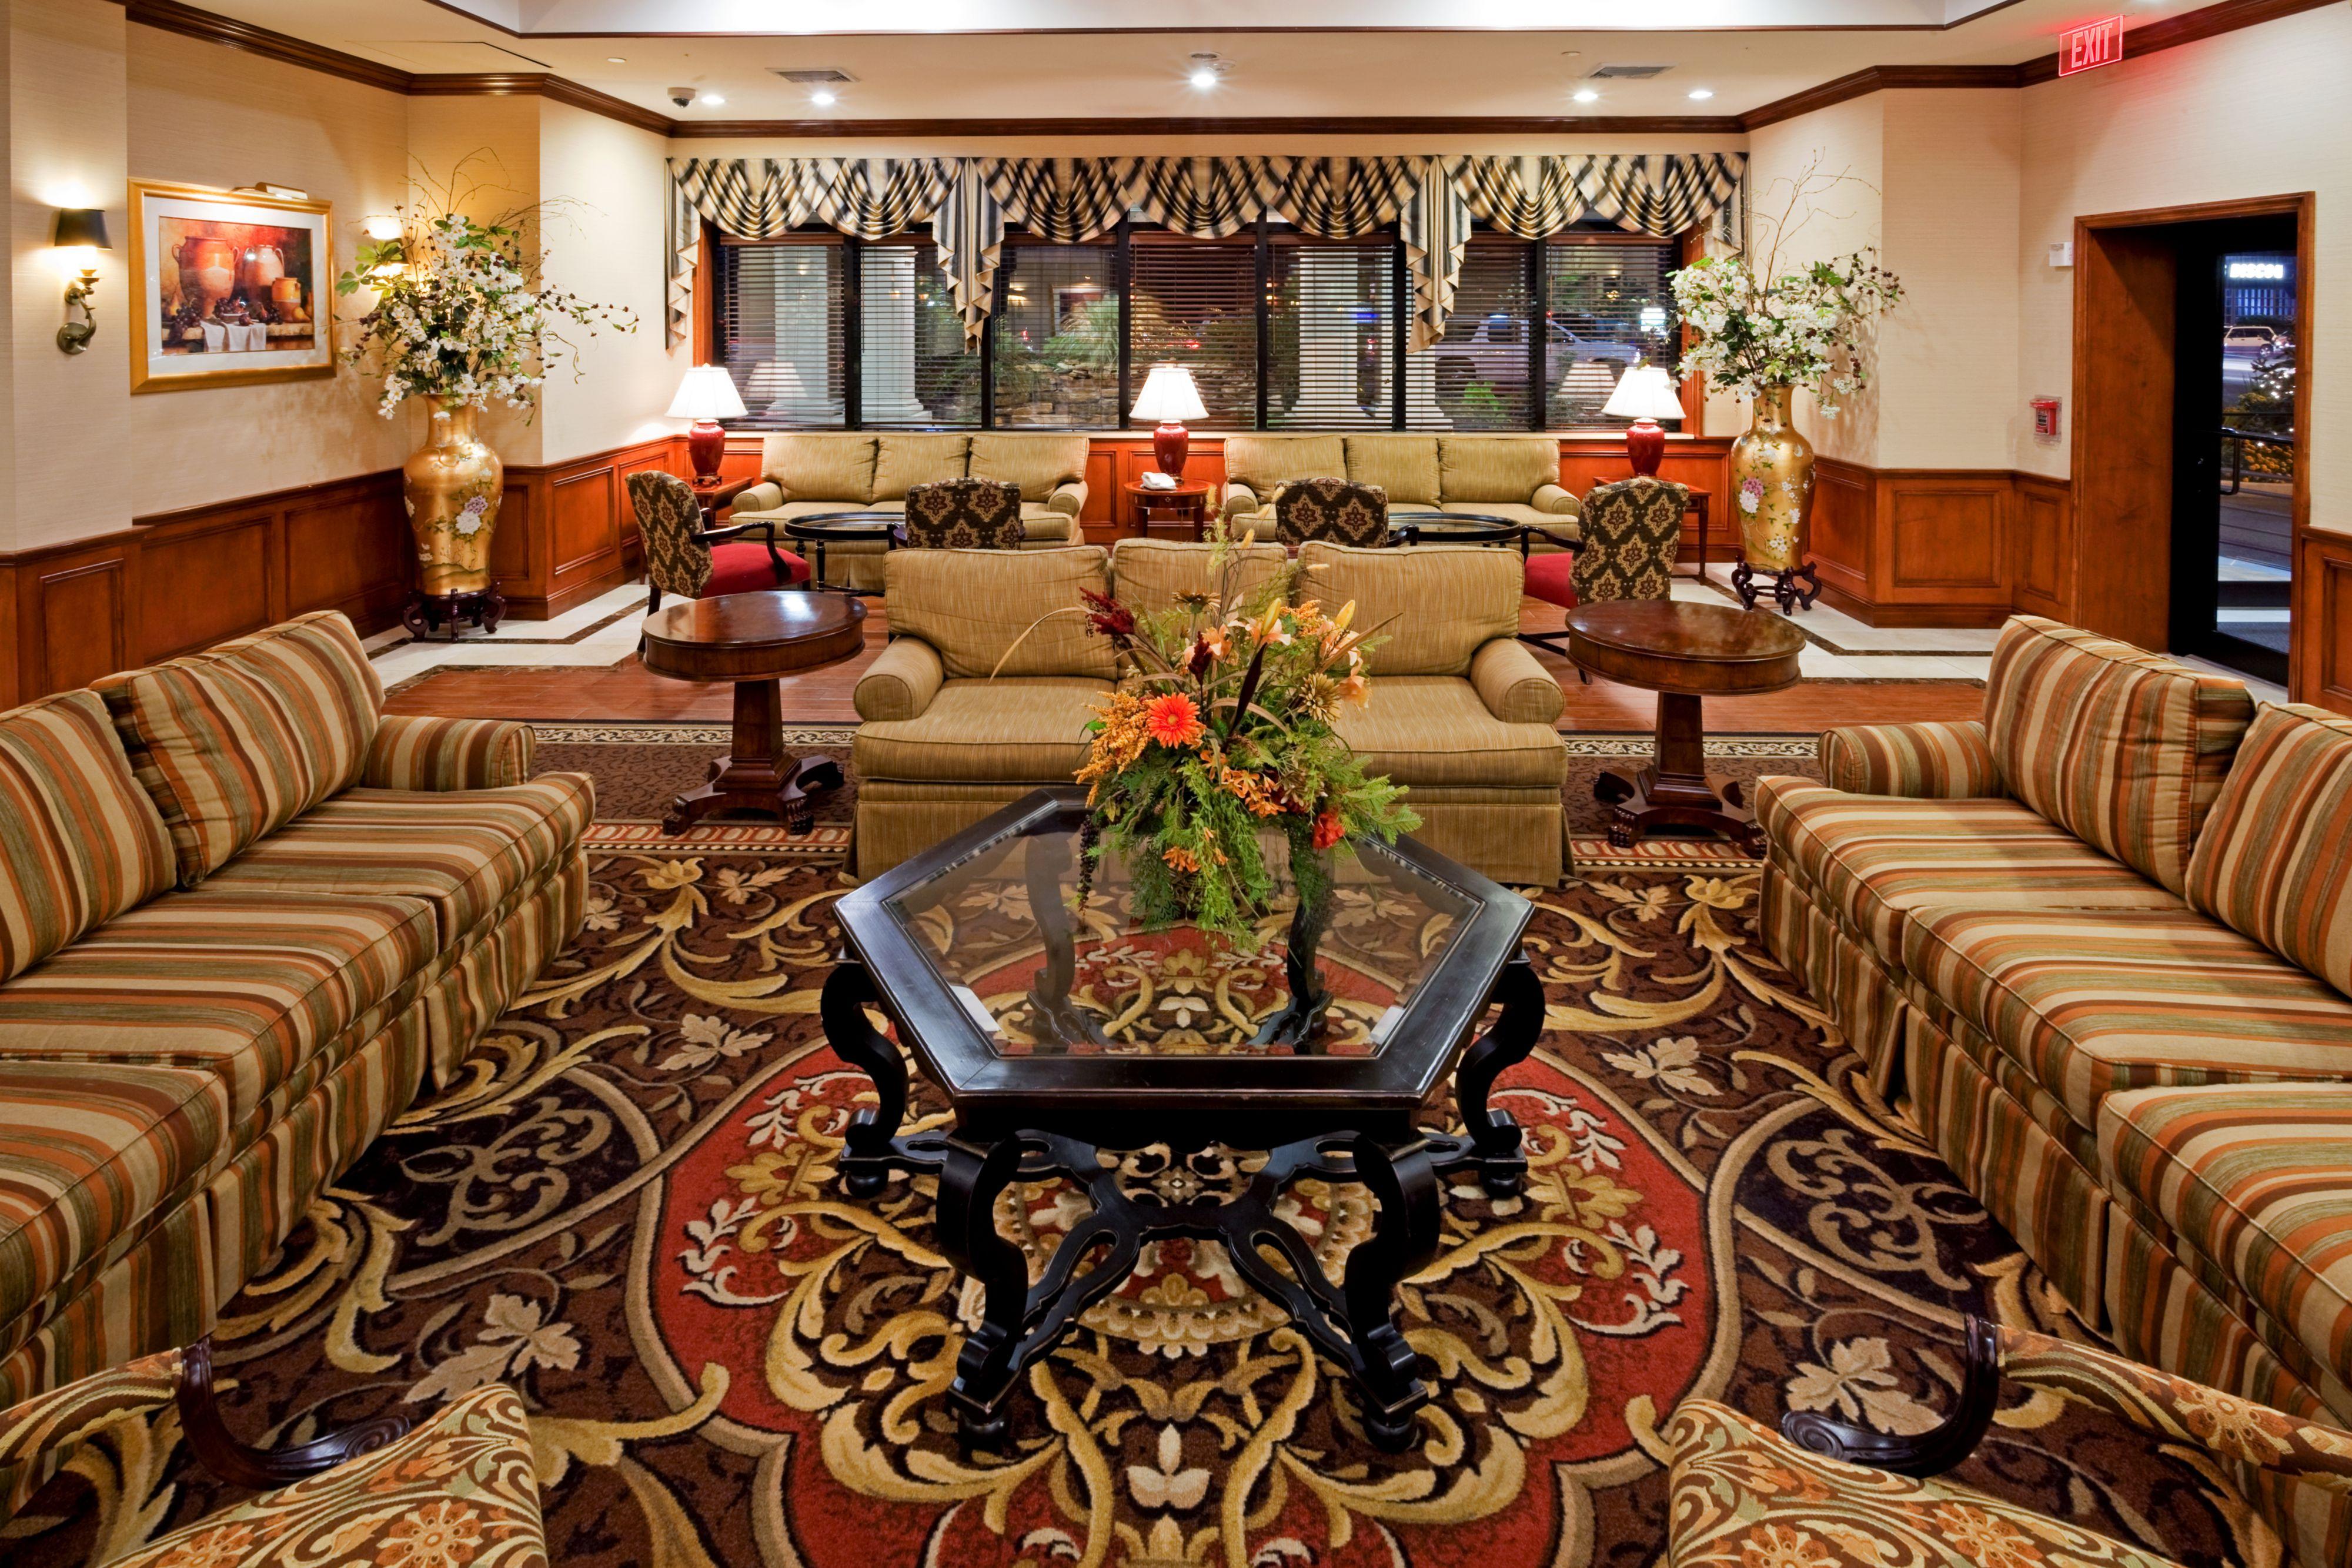 Holiday Inn Express Lynbrook - Rockville Centre image 4